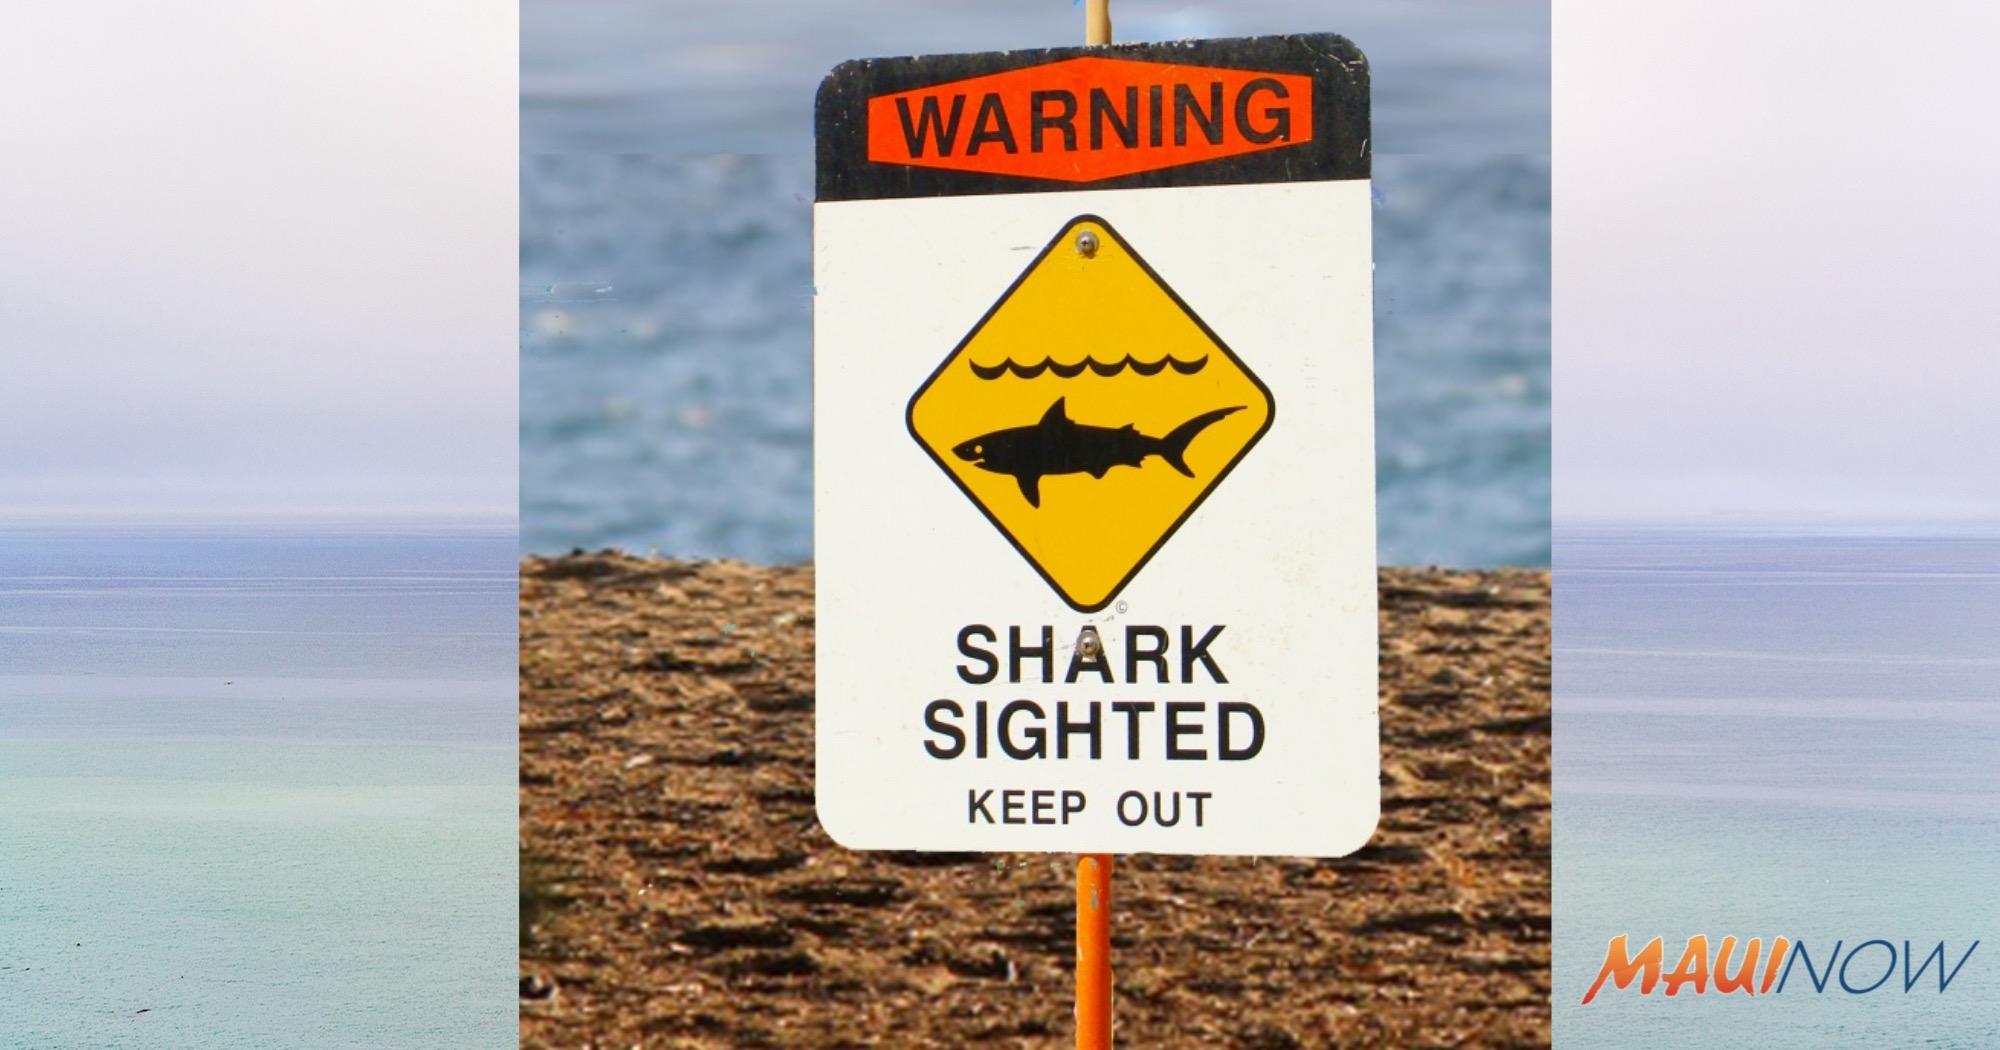 Experts: Shark in Hawaii Island Incident Likely Galapagos